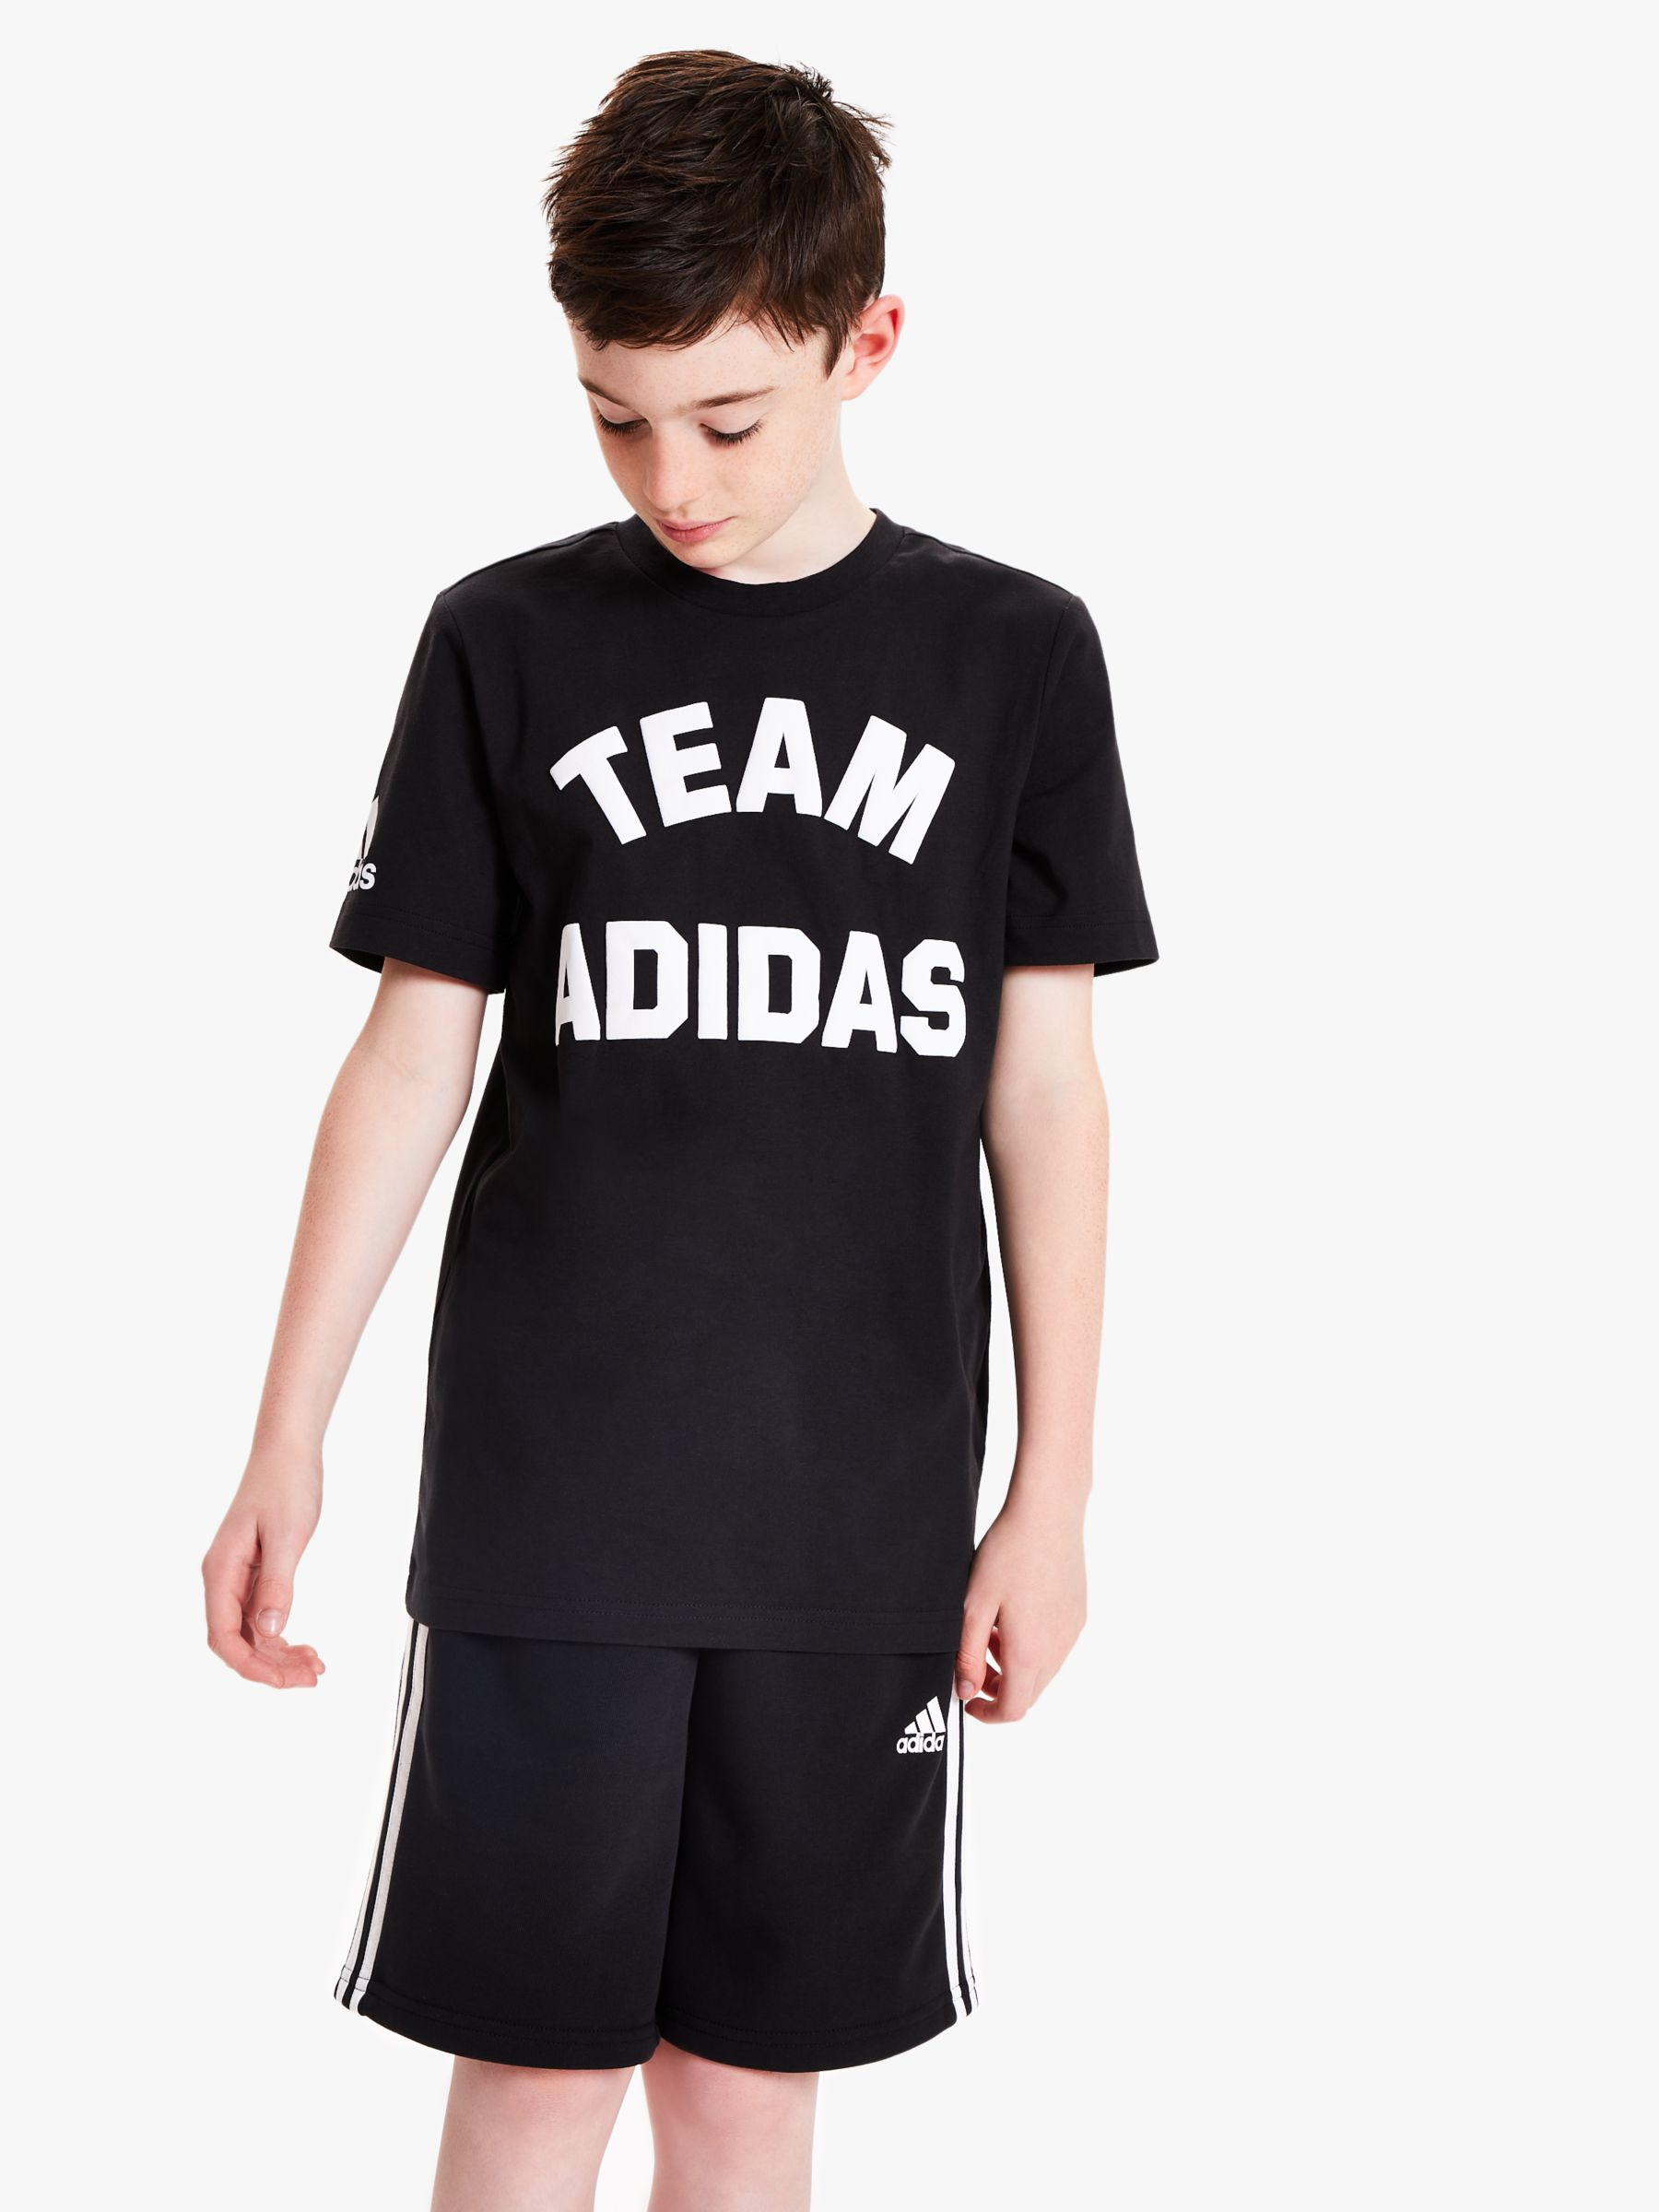 adidas team t shirts